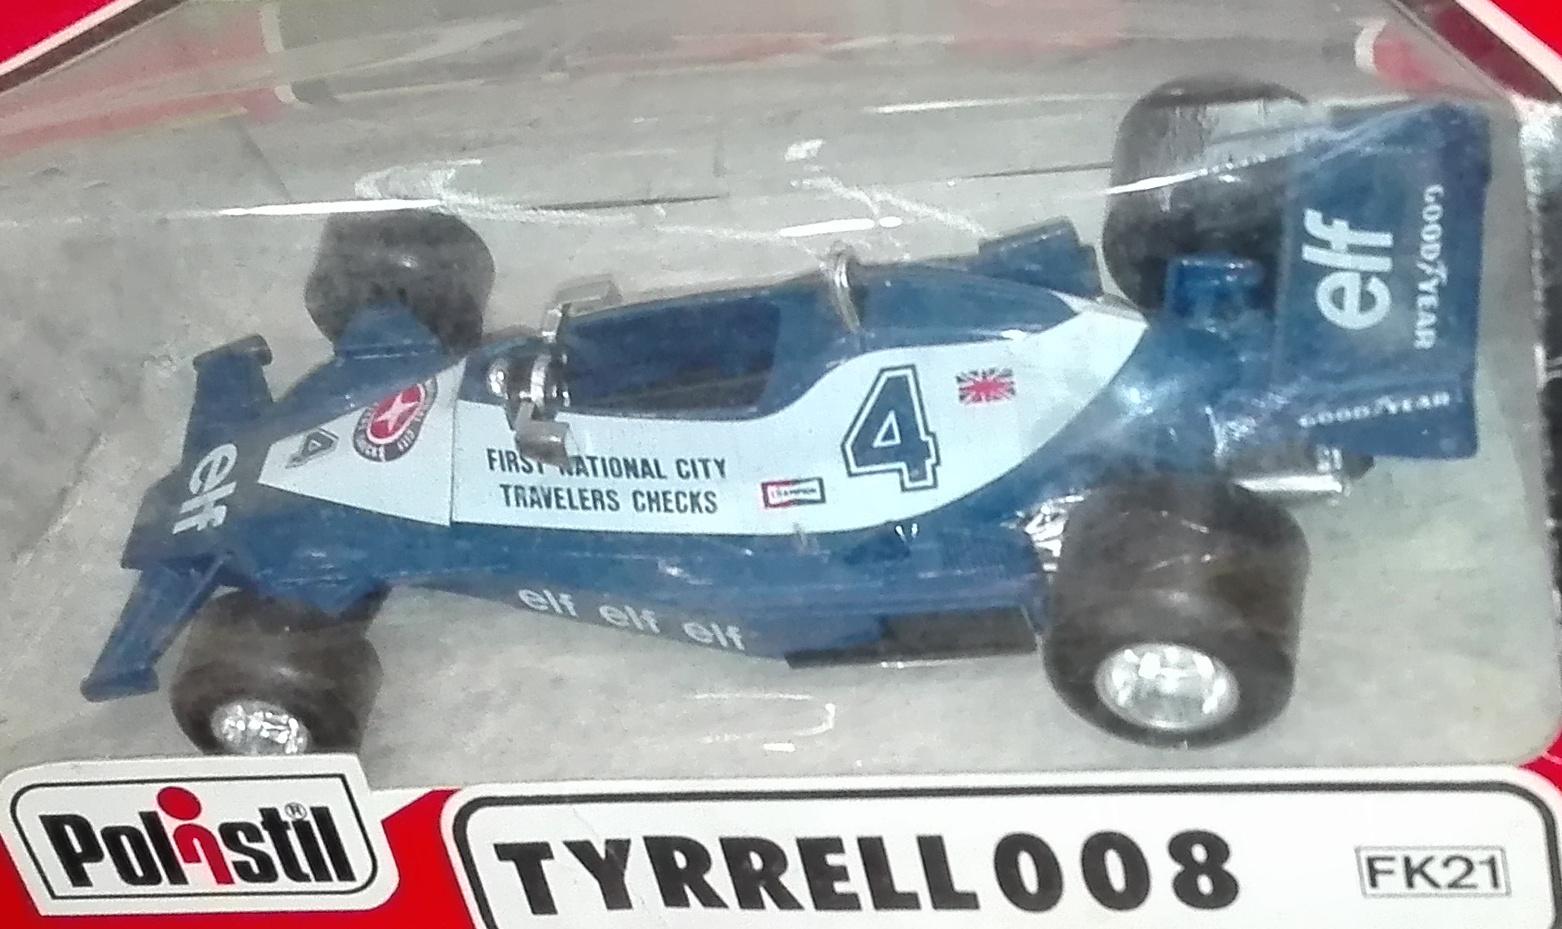 FK21, Tyrrell 008 (cc-by-sa mia foto)